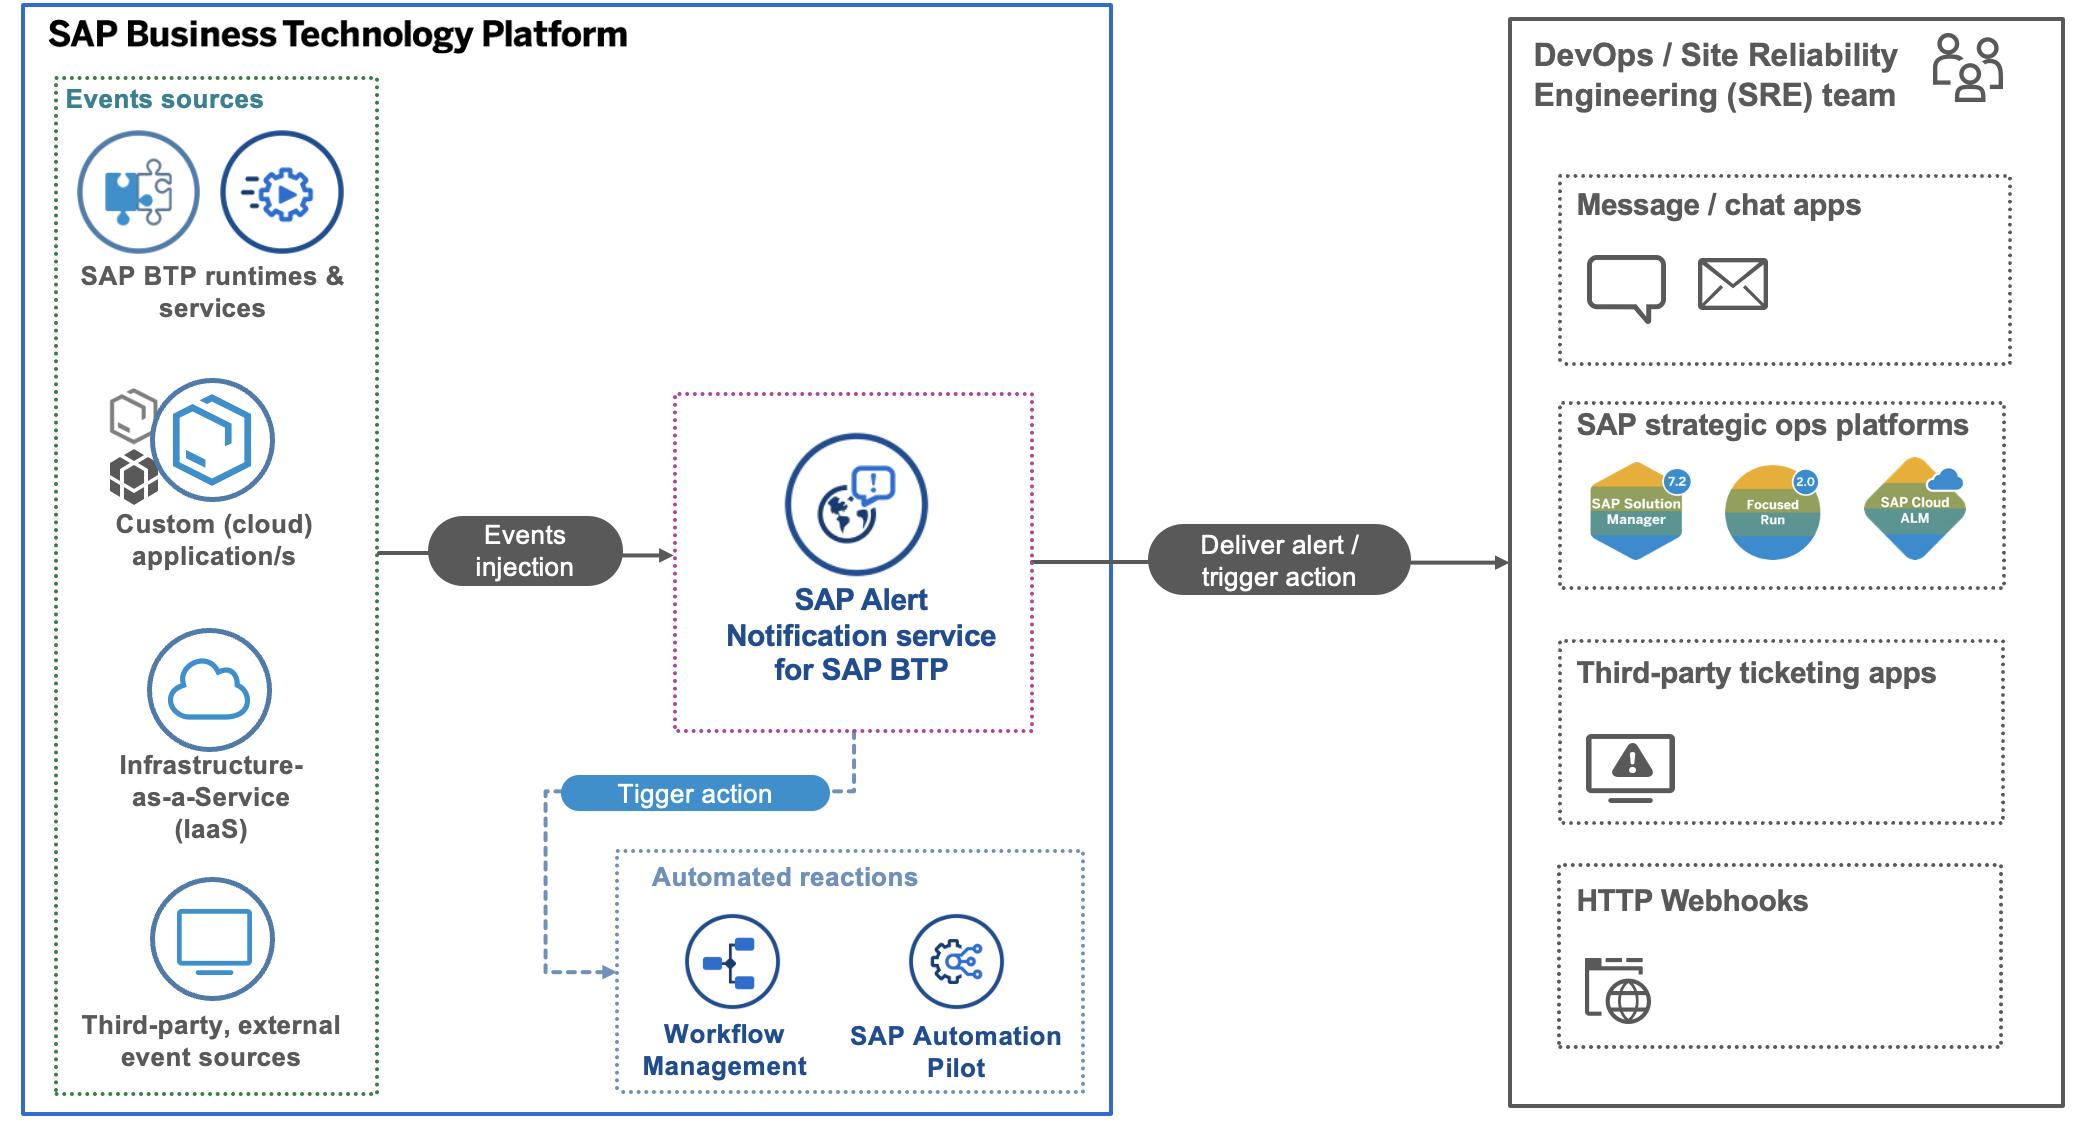 SAP Discovery Center - Alert Notification Service